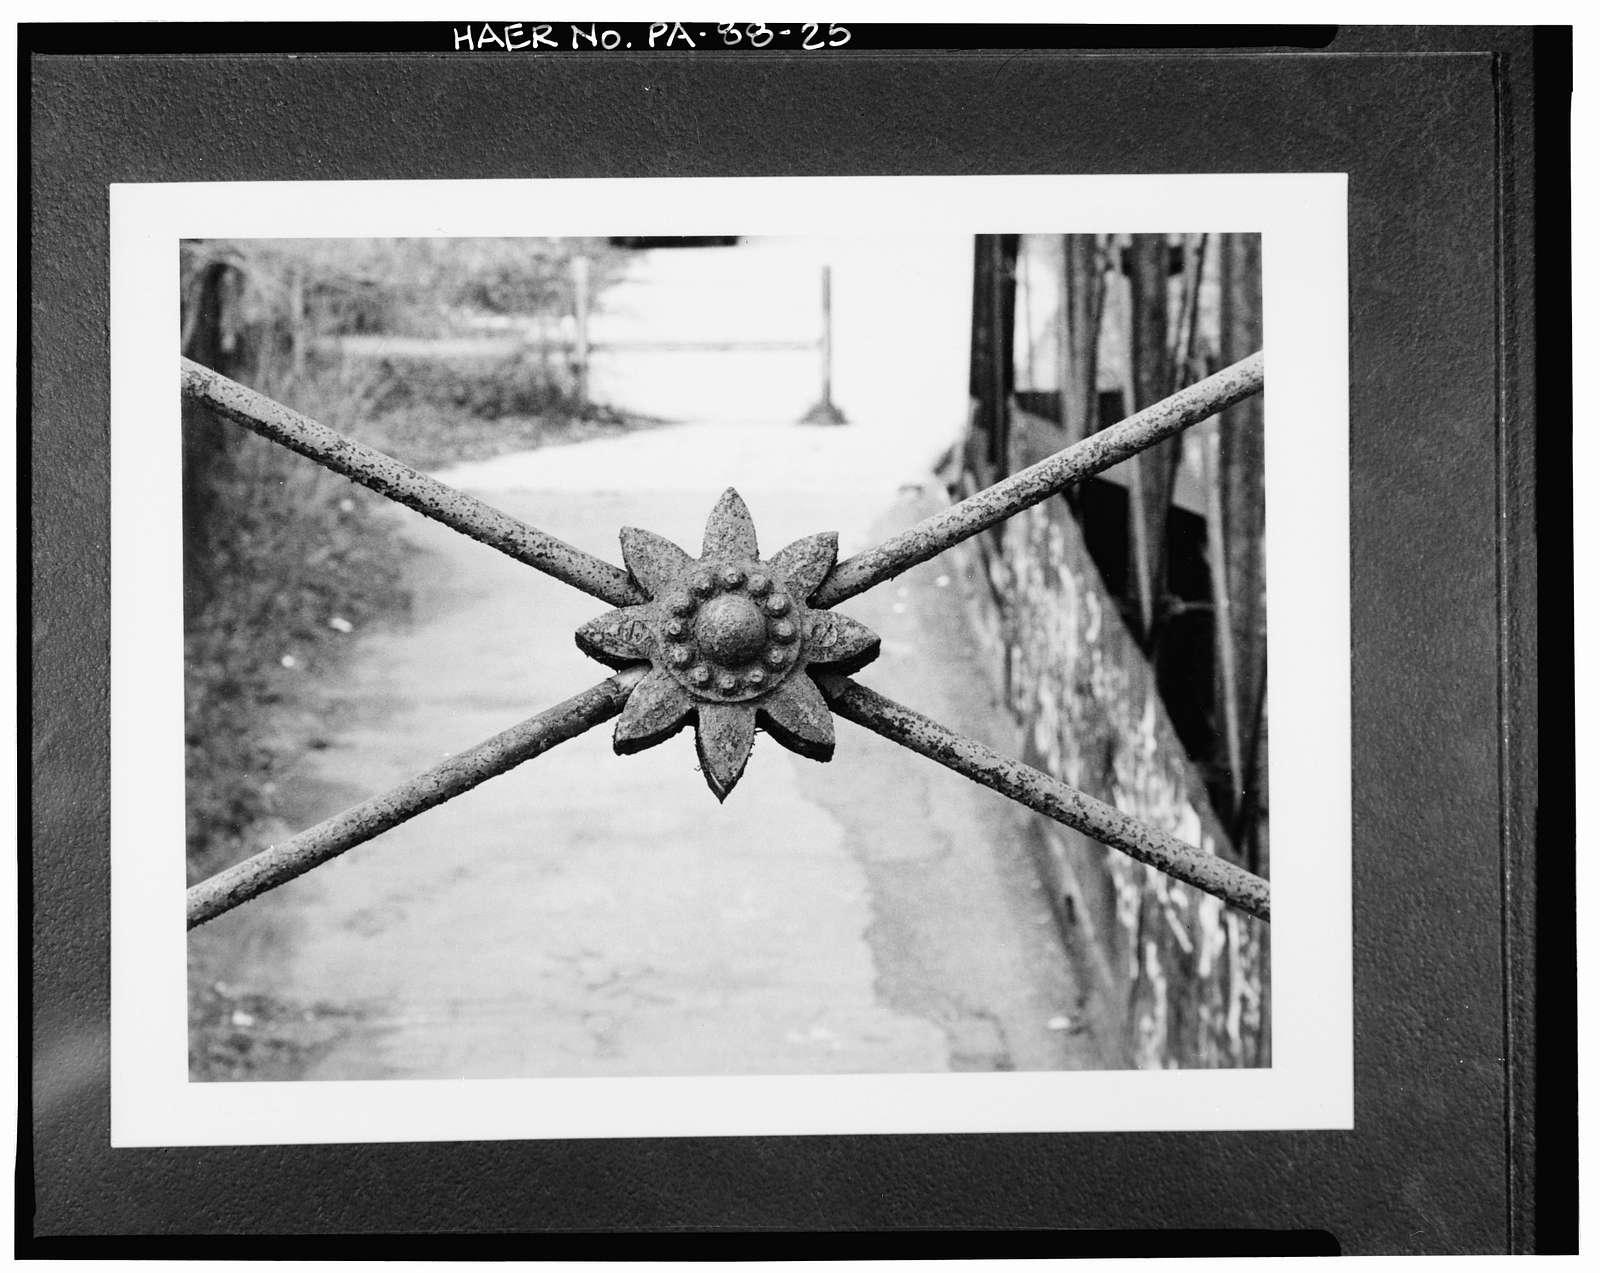 Christiana Borough Bridge, Bridge Street over Pennsylvania Railroad, Christiana, Lancaster County, PA